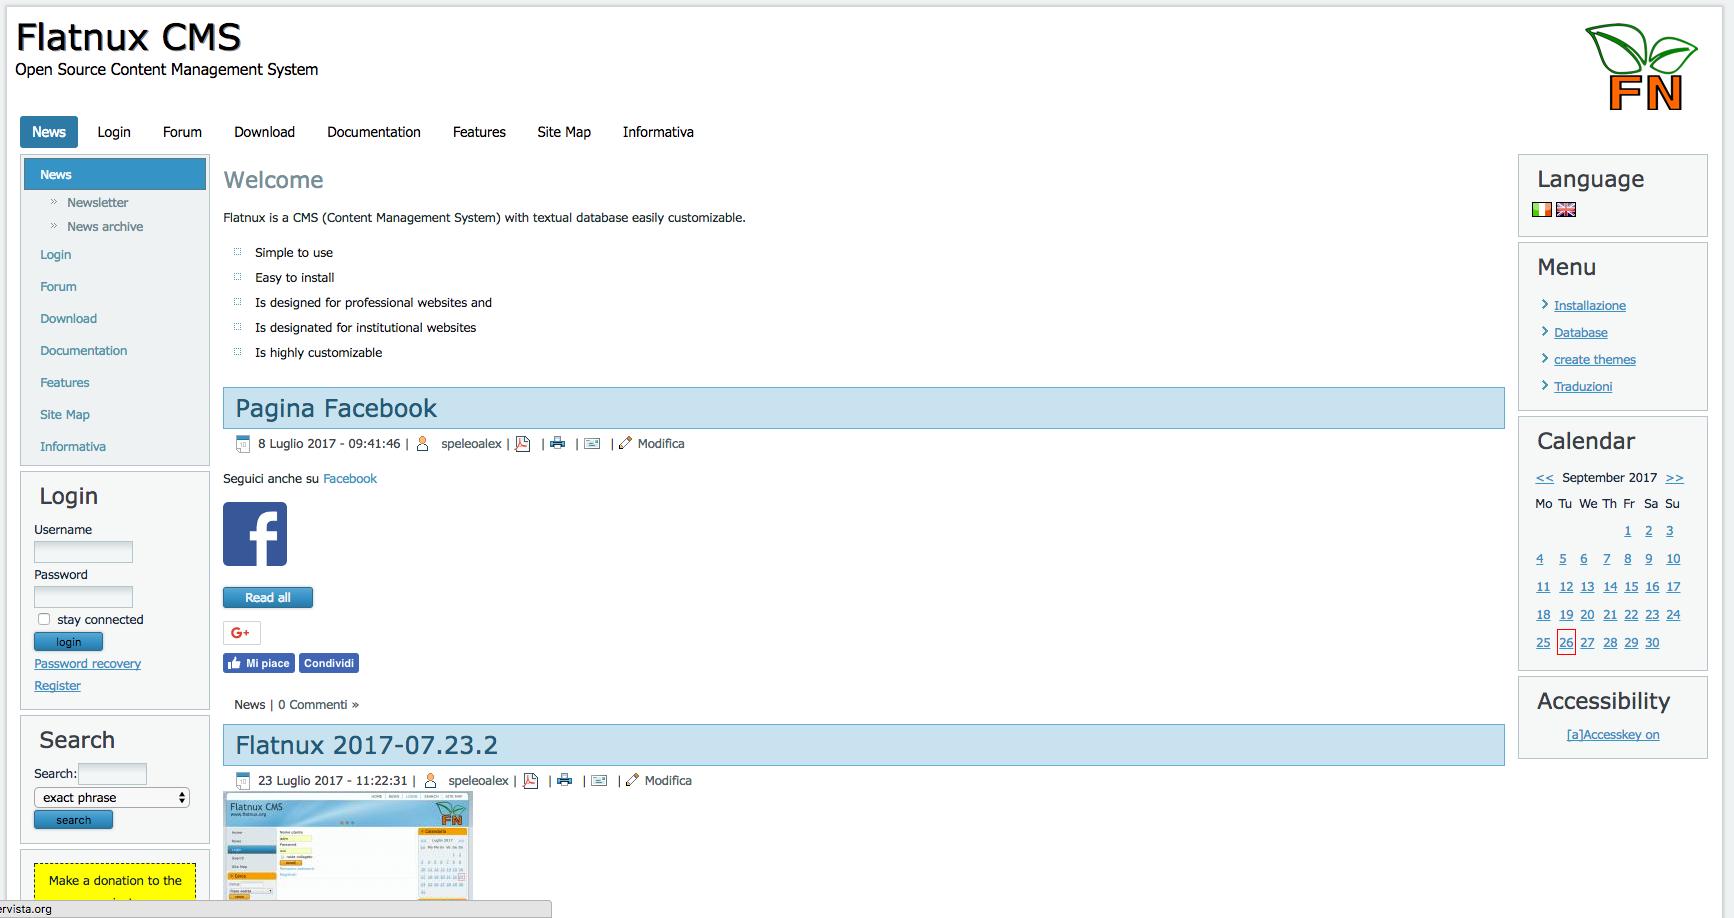 flatnux demo preview